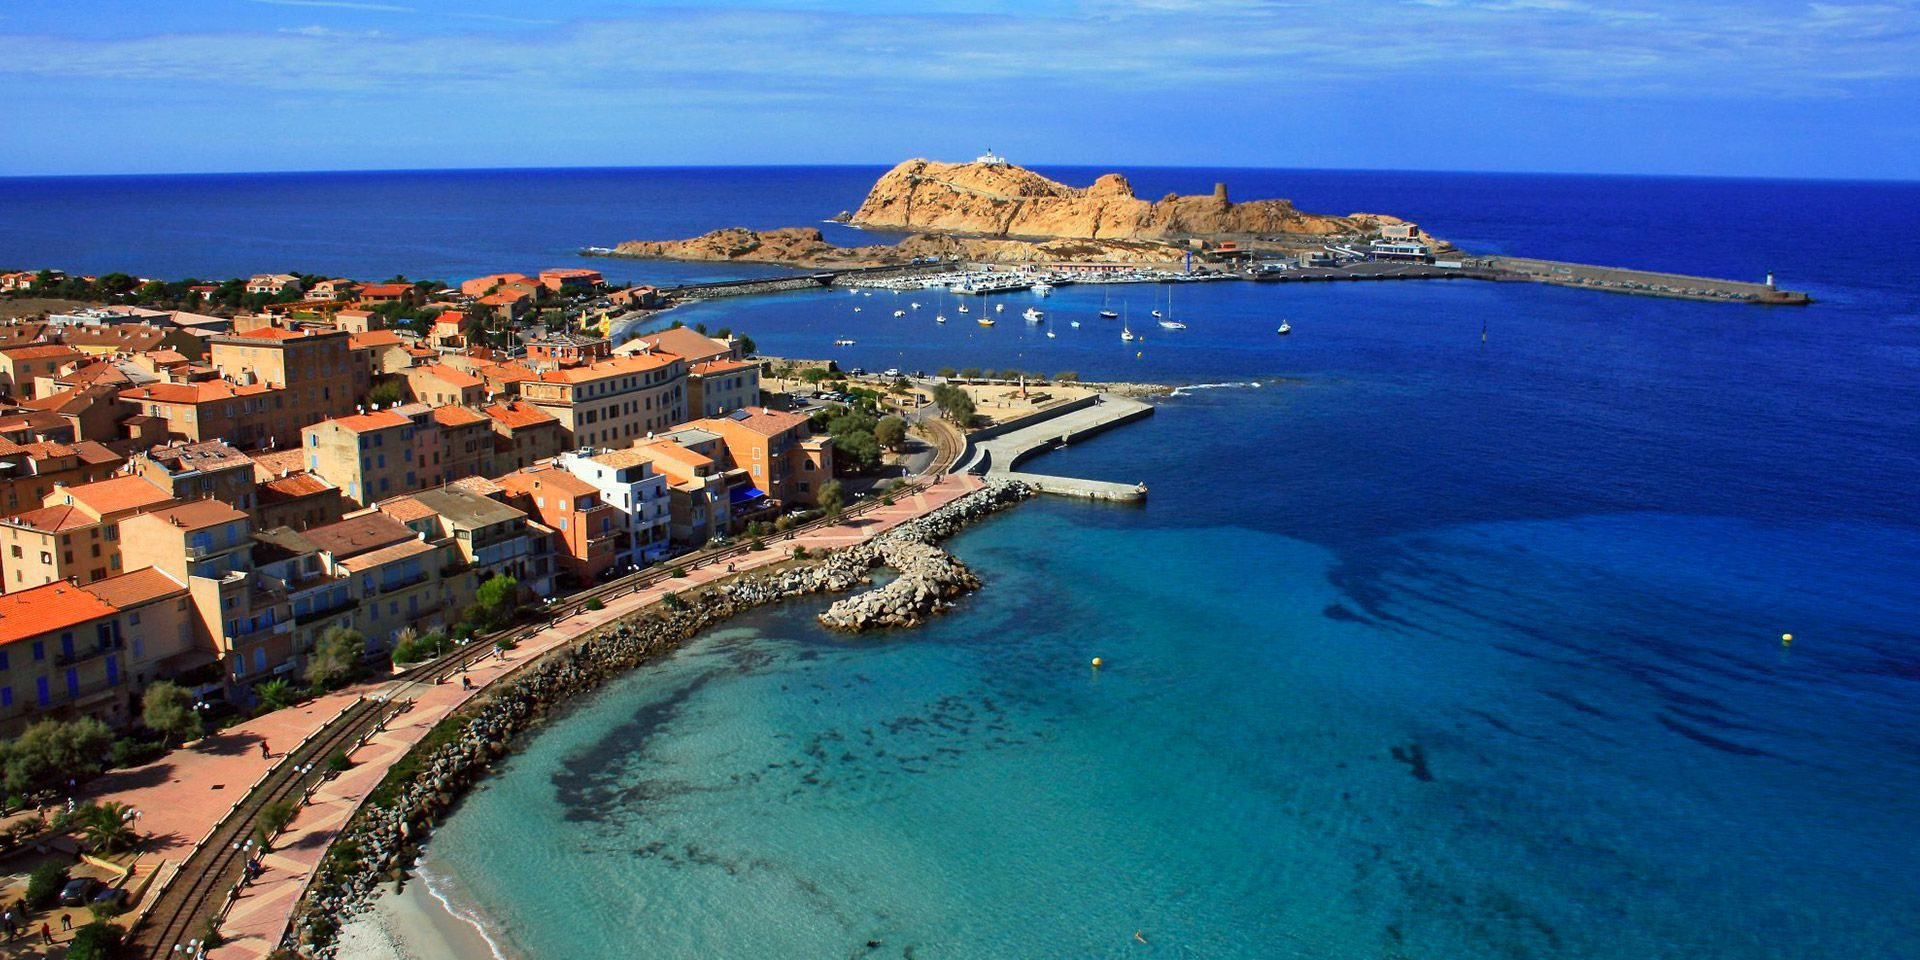 Ile Rousse Balagne Corsica Frankrijk Isula Rossa Ile de la Pietra